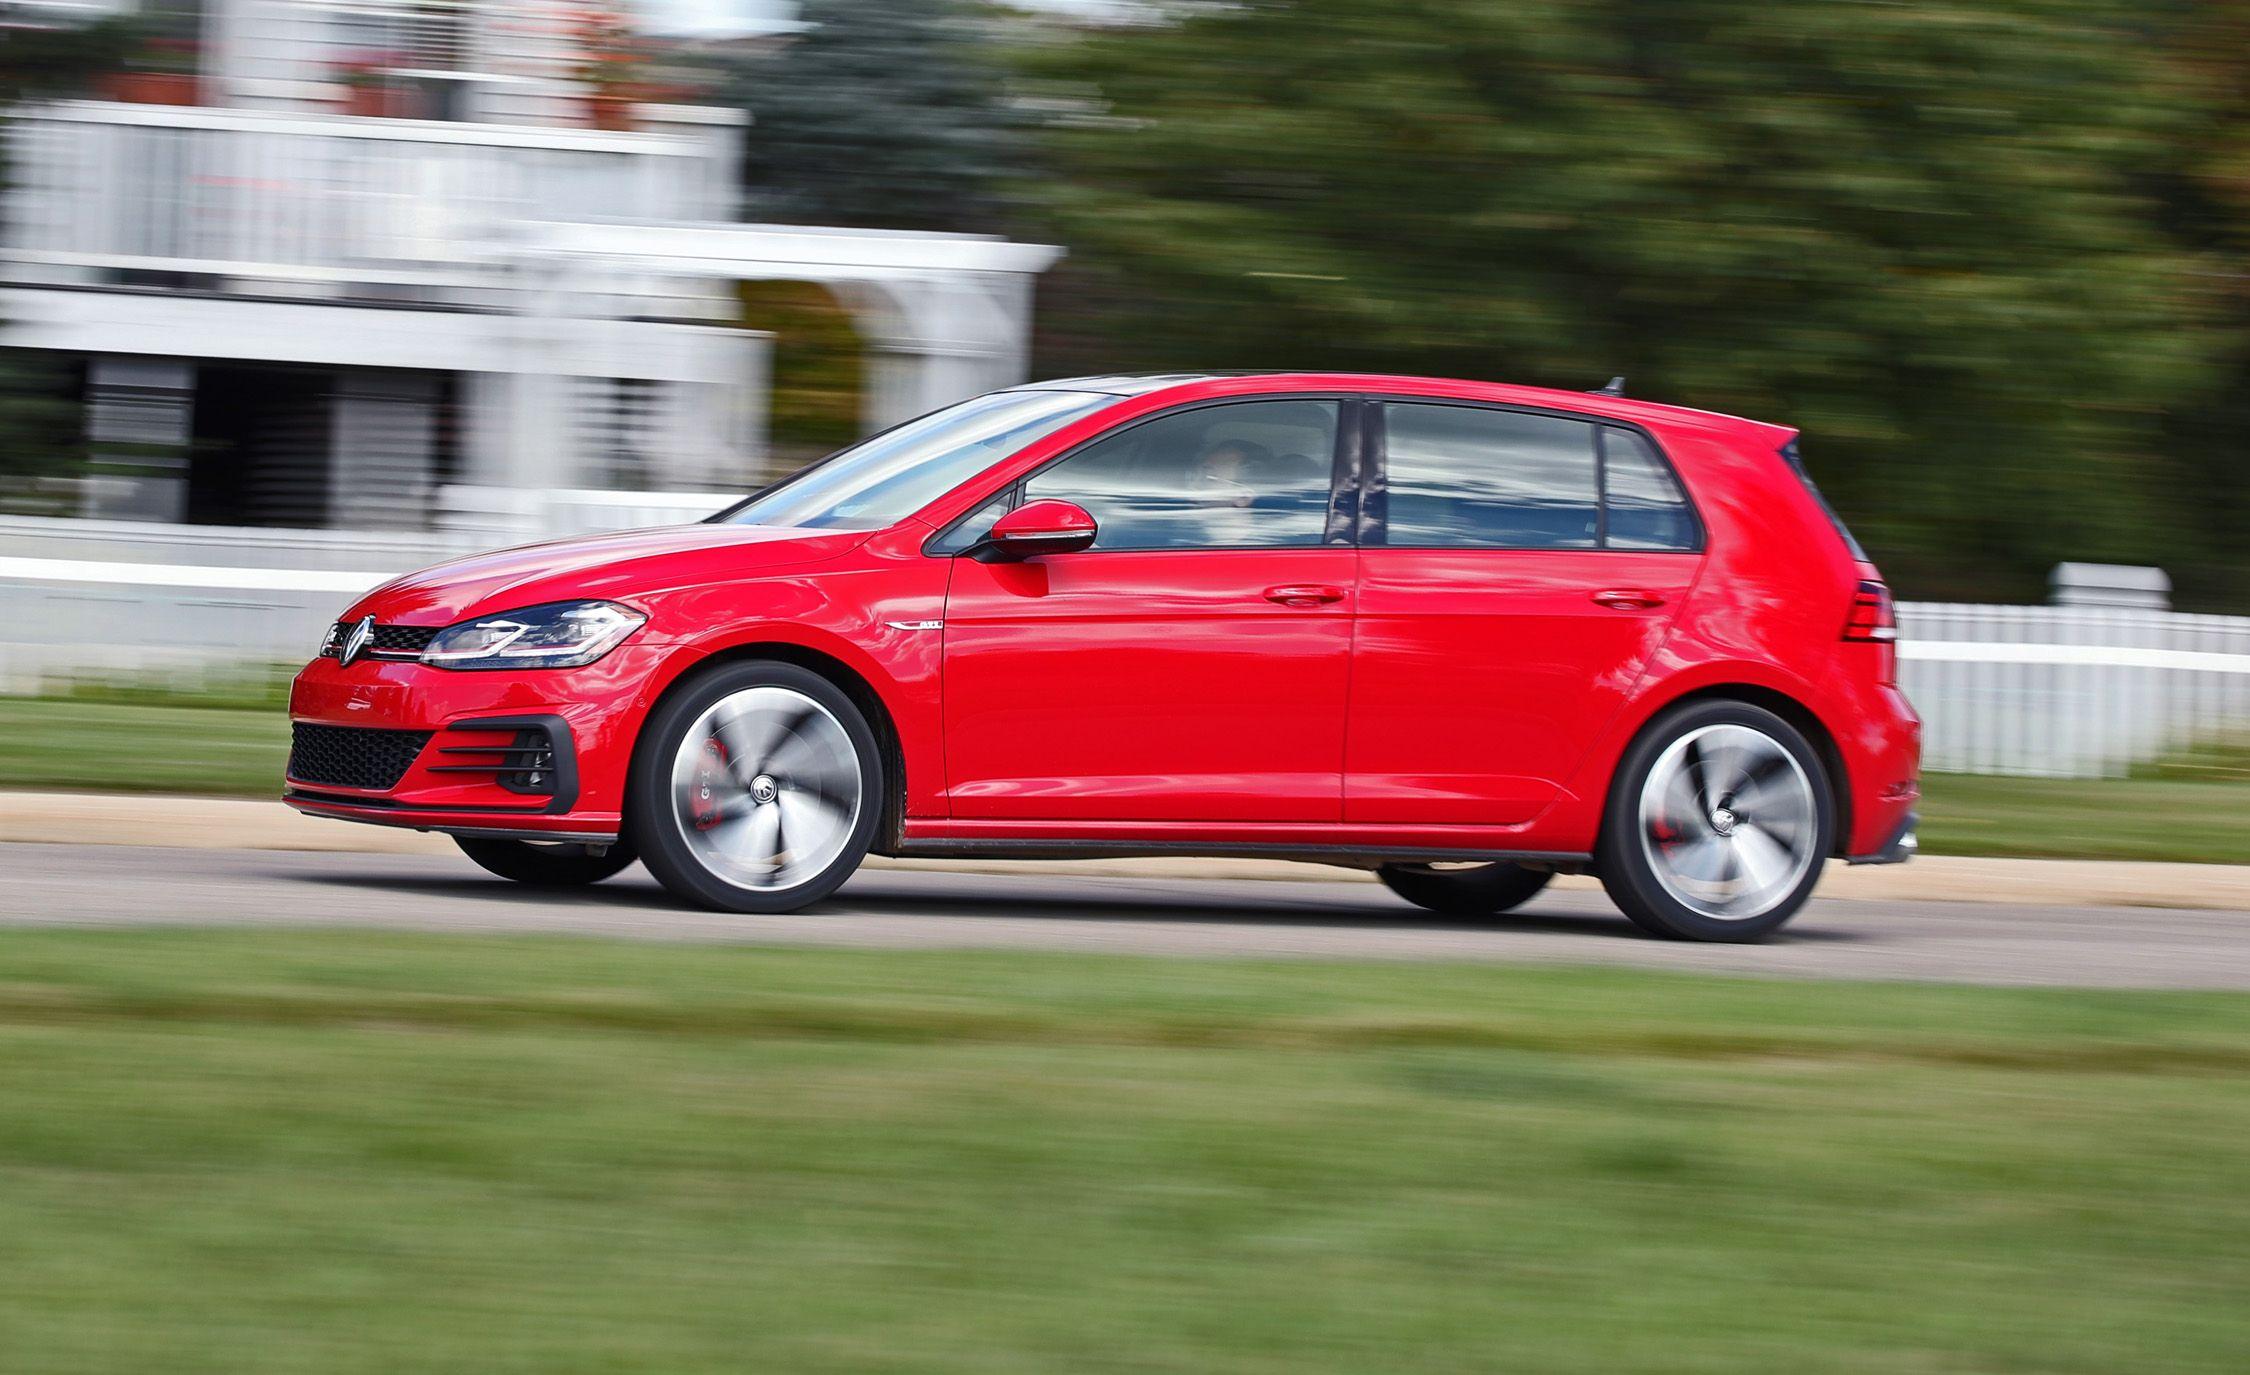 Volkswagen gti transmission problems